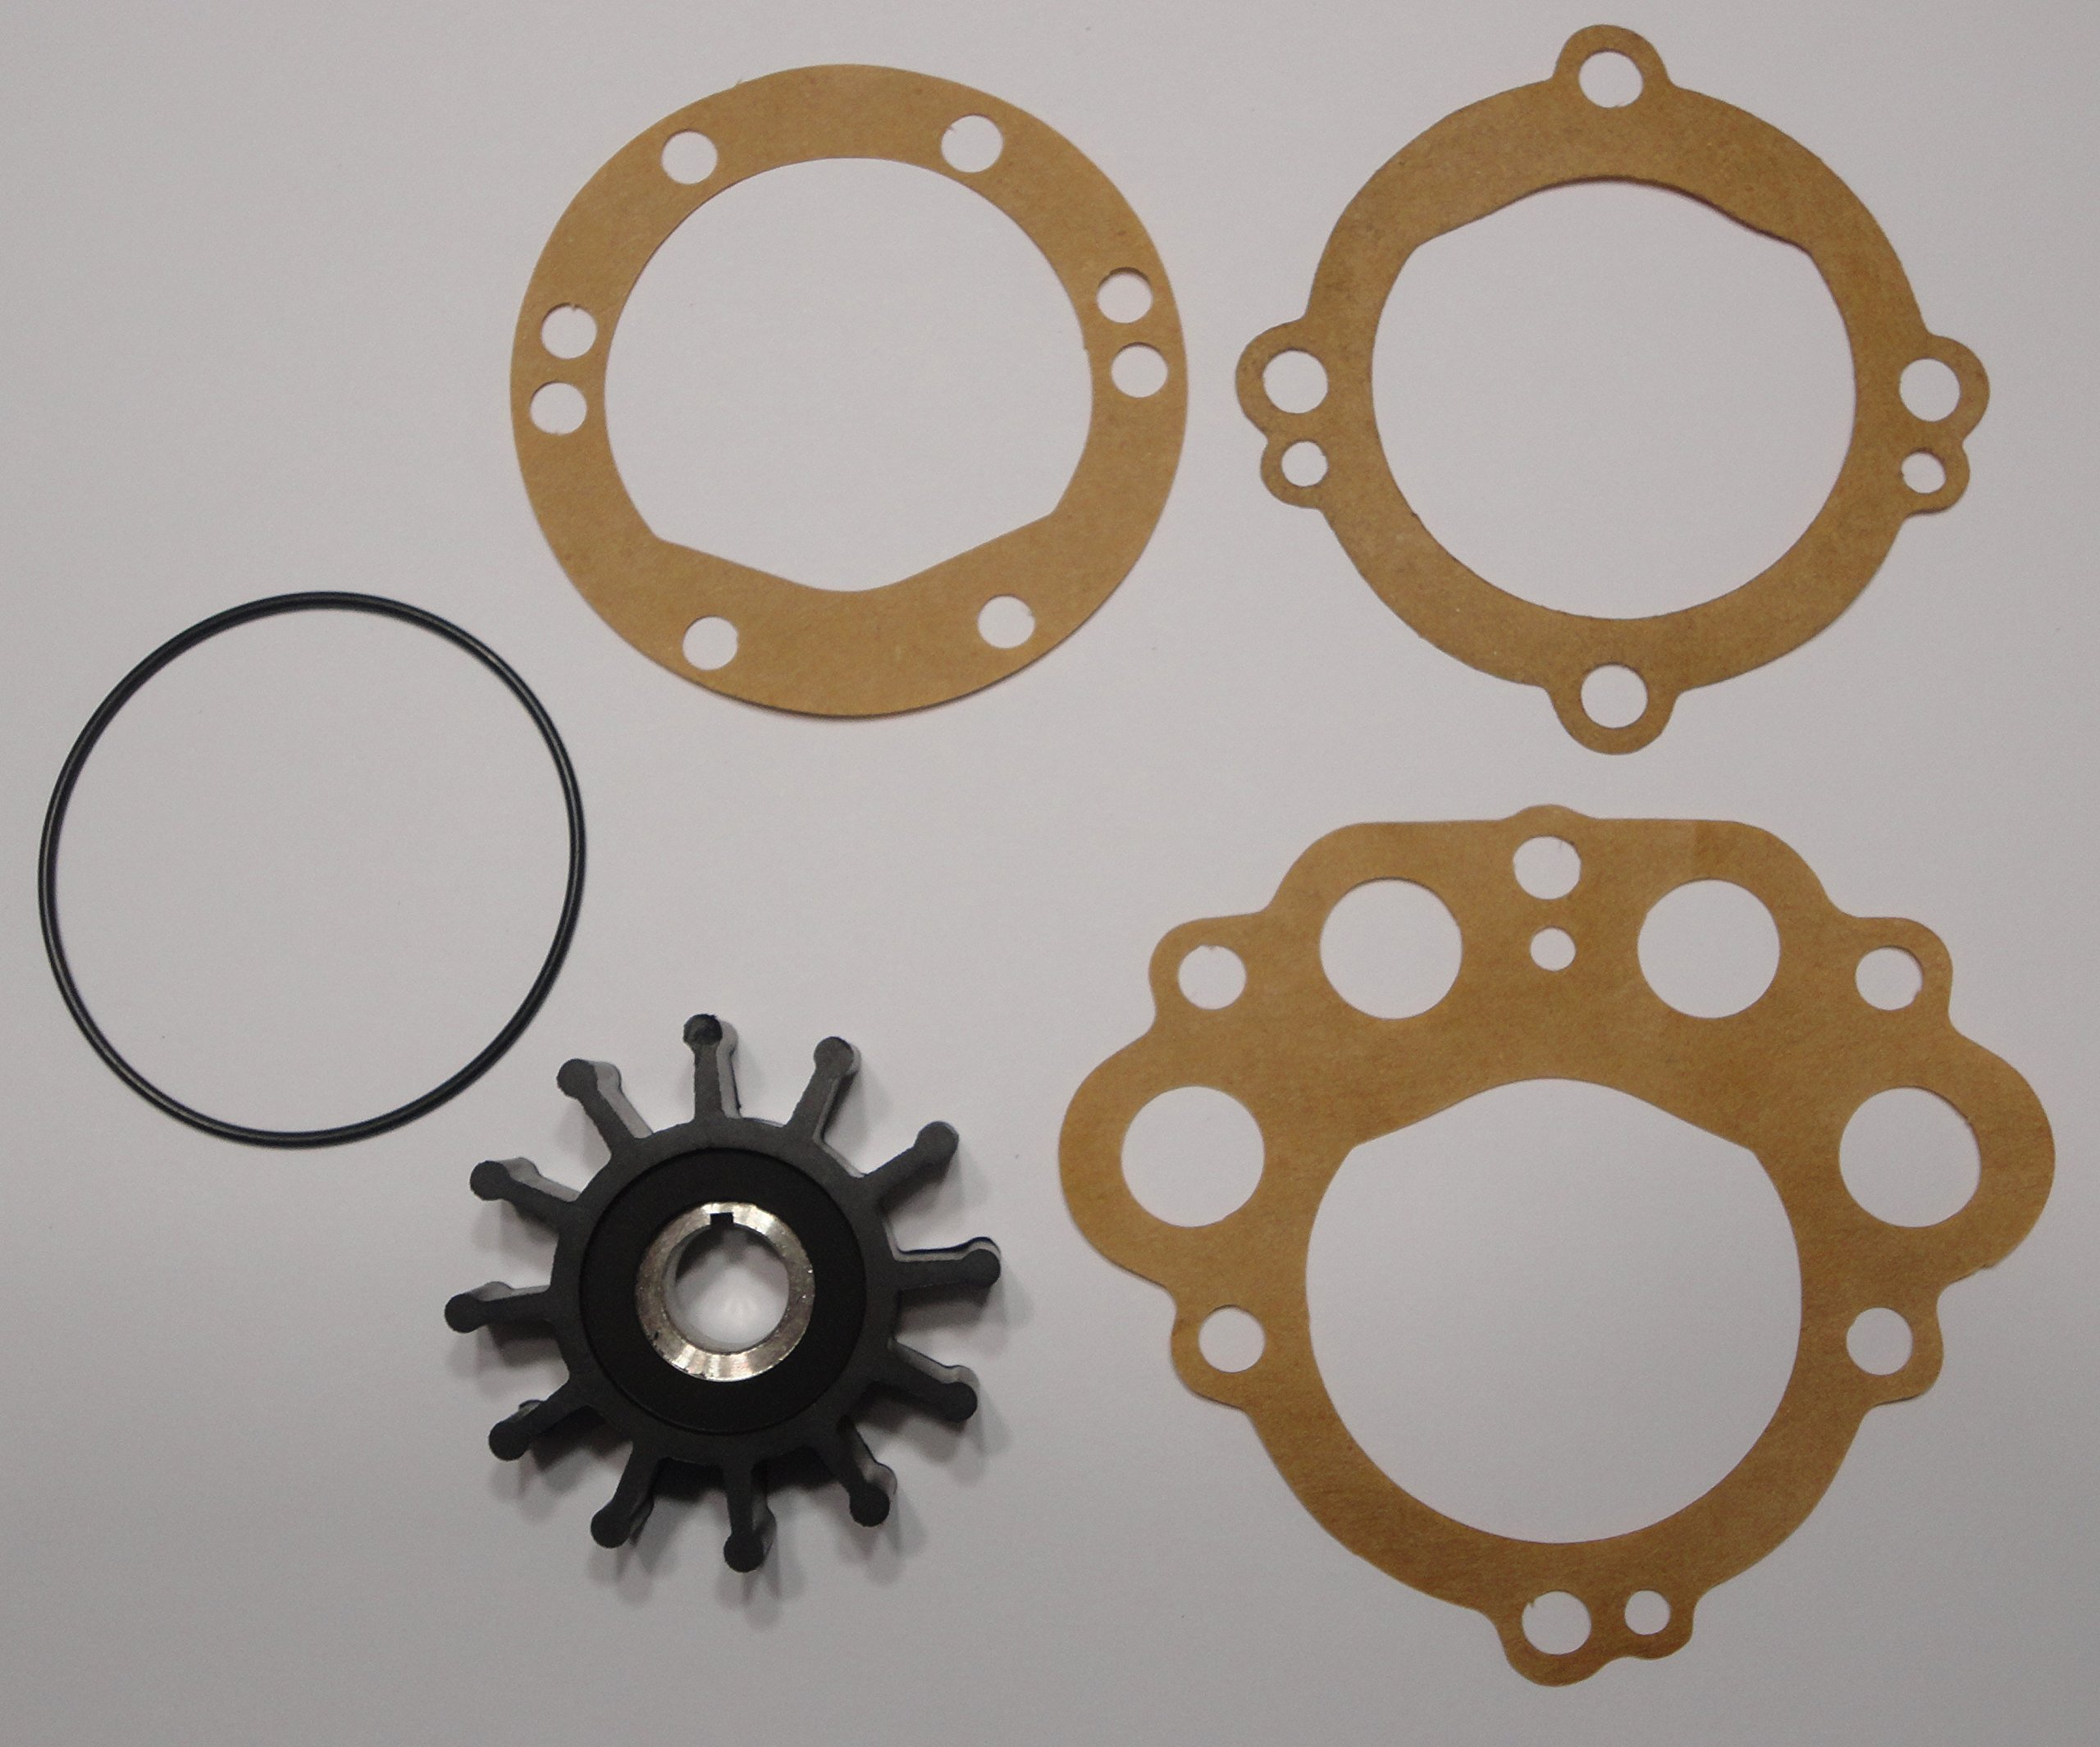 StayCoolPumps Impeller Kit Replaces Sherwood 10077K by StayCoolPumps